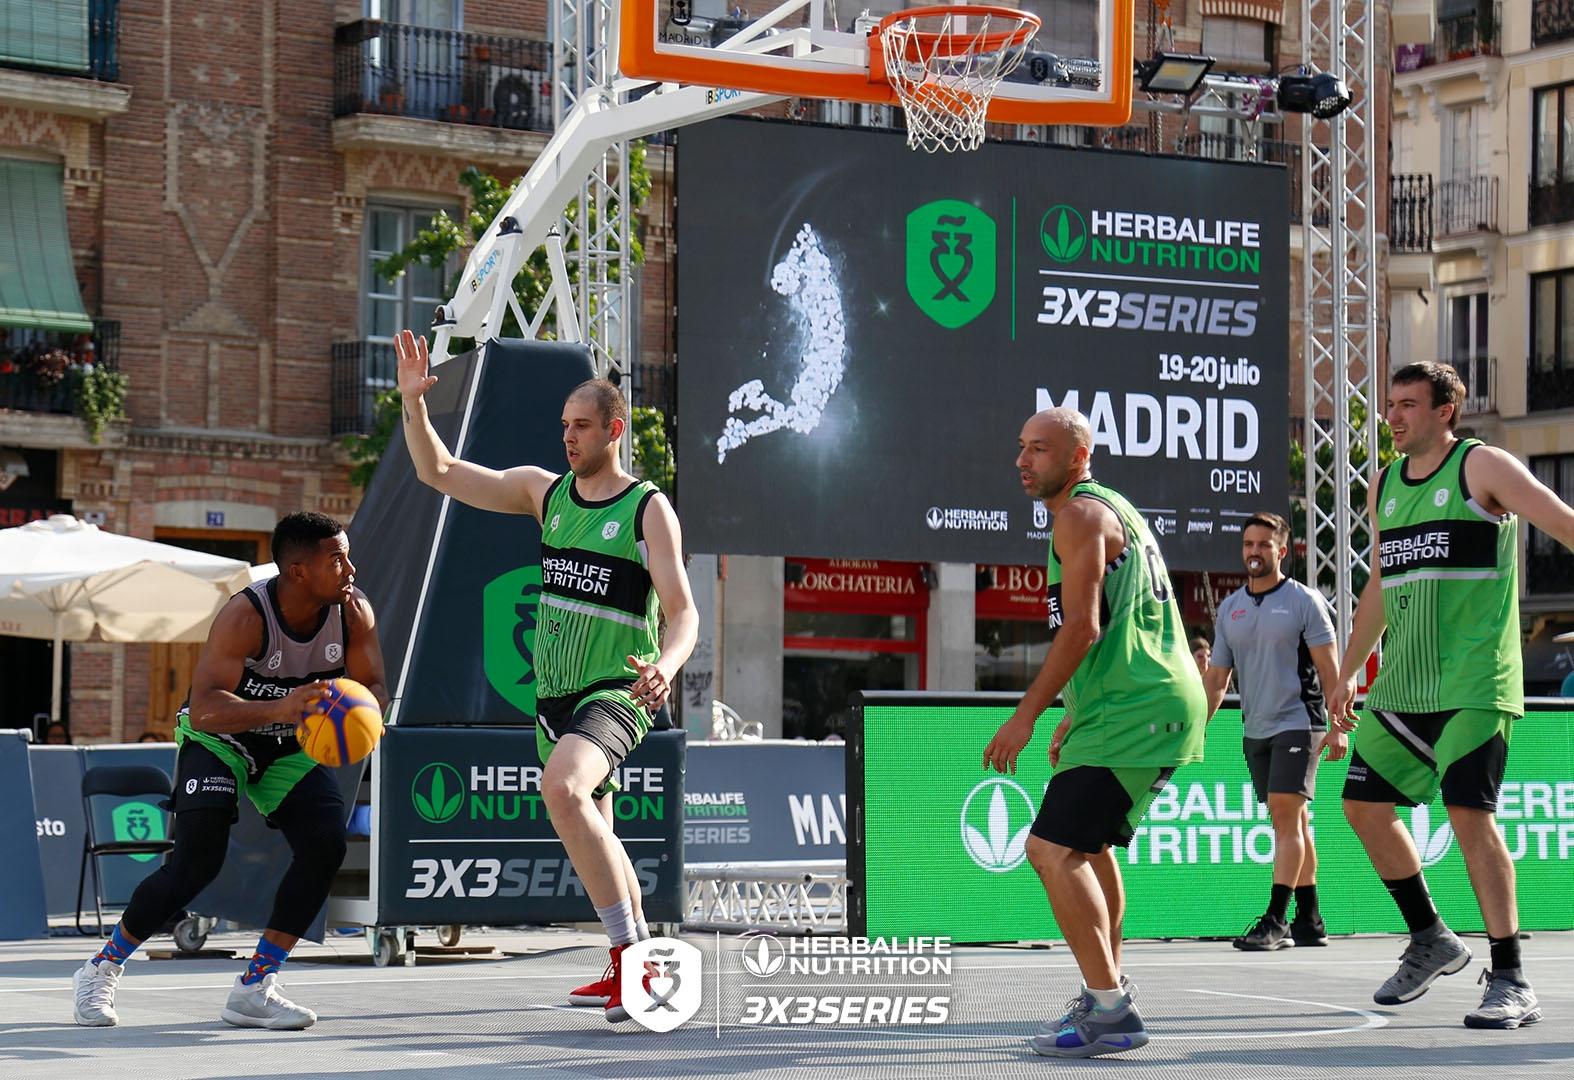 MadridOpen2019_Herbalife3x3Series_viernes_12